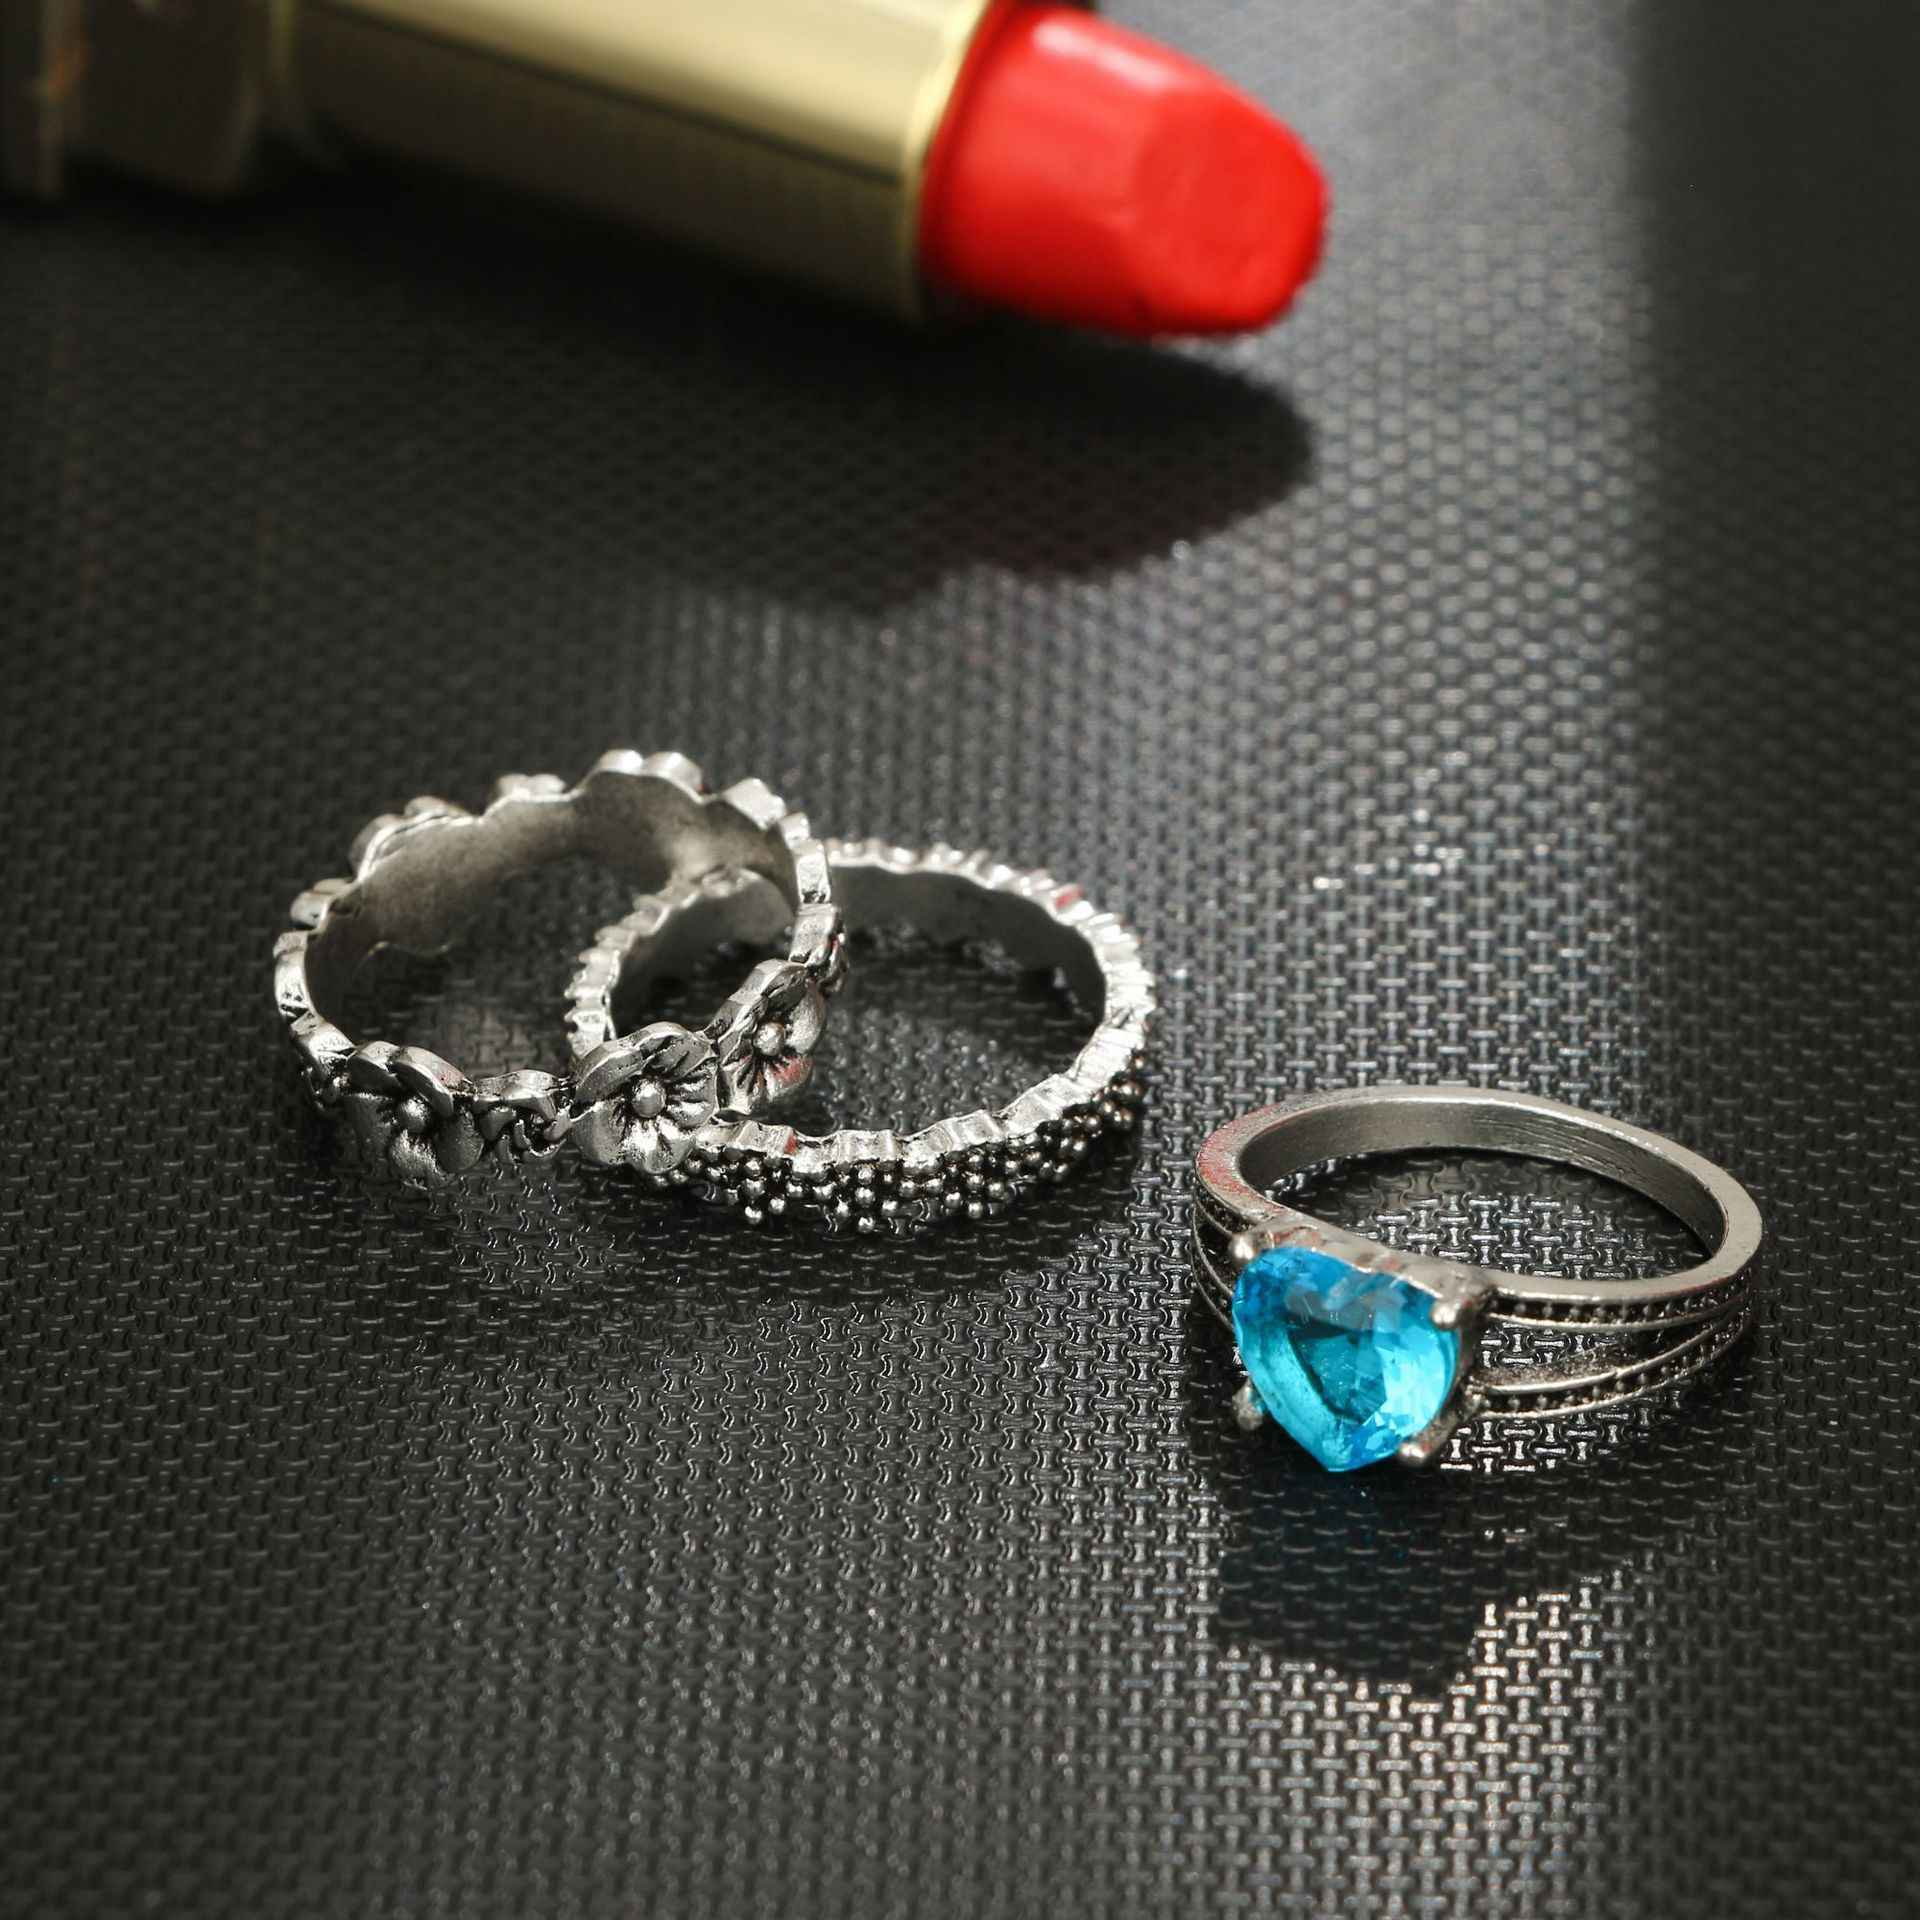 1 Set Ocean Blue Vintage Knuckle Rings for Women Boho Geometric Flower Crystal Ring Set Bohemian Finger Jewelry